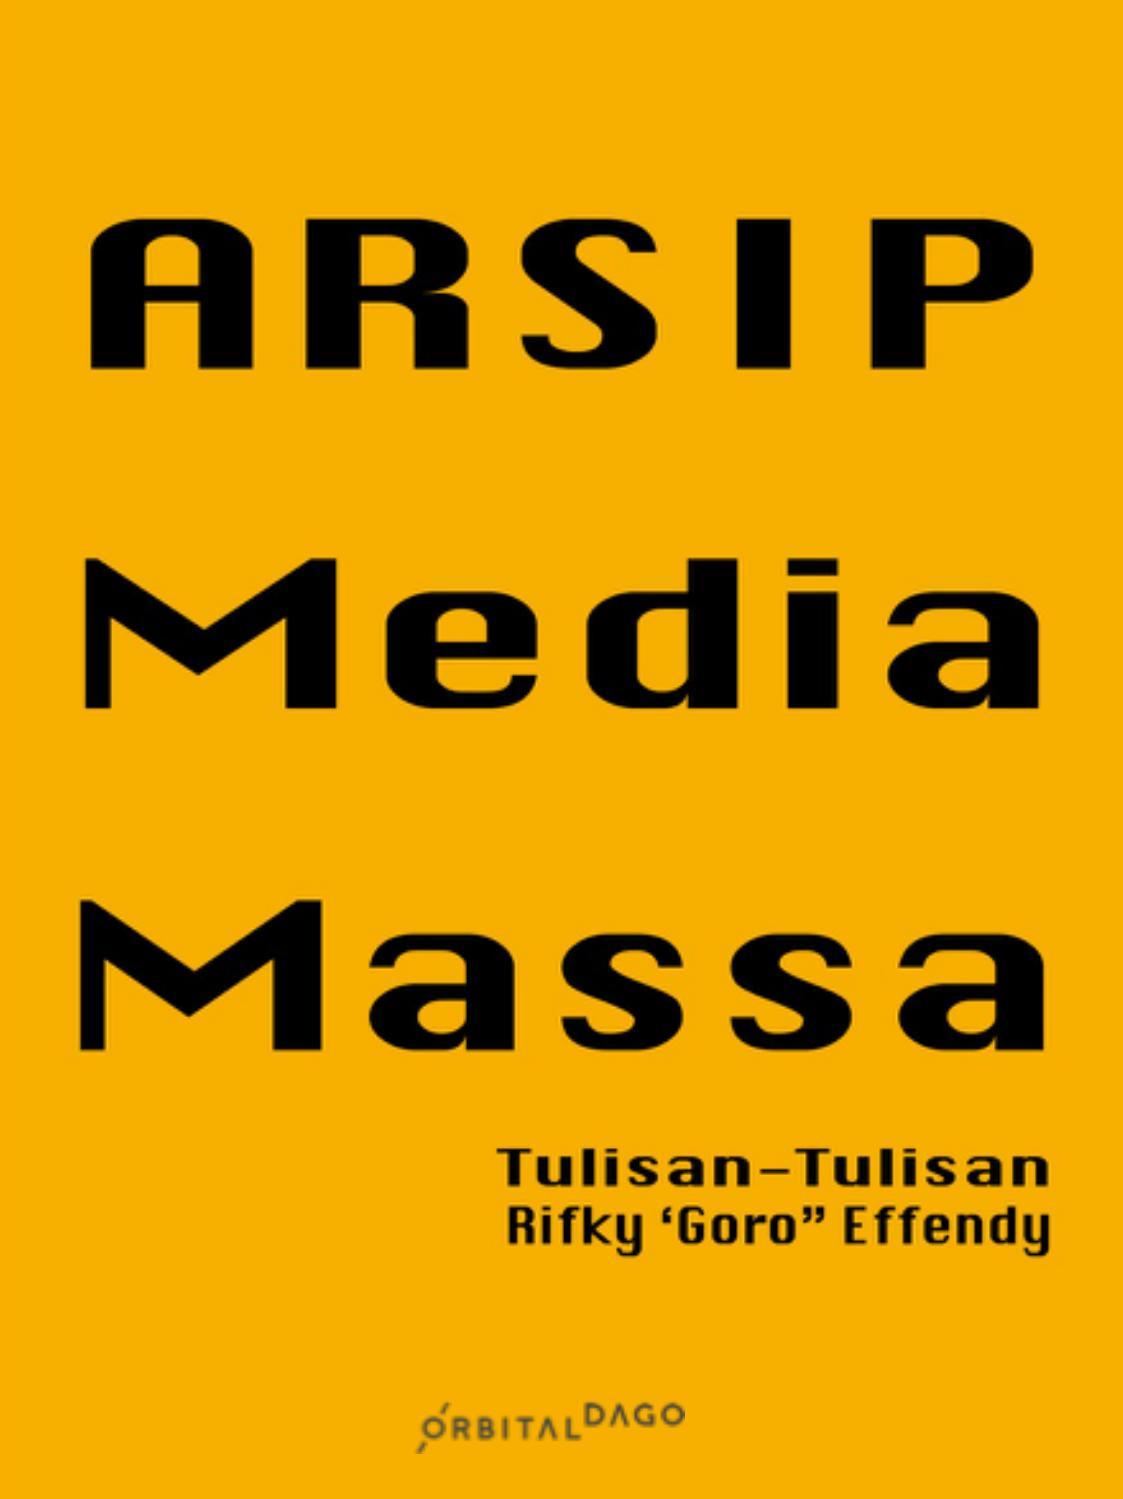 Arsip Media Massa Tulisan Tulisan Rifky Goro Effendy By Orbital Dago Issuu